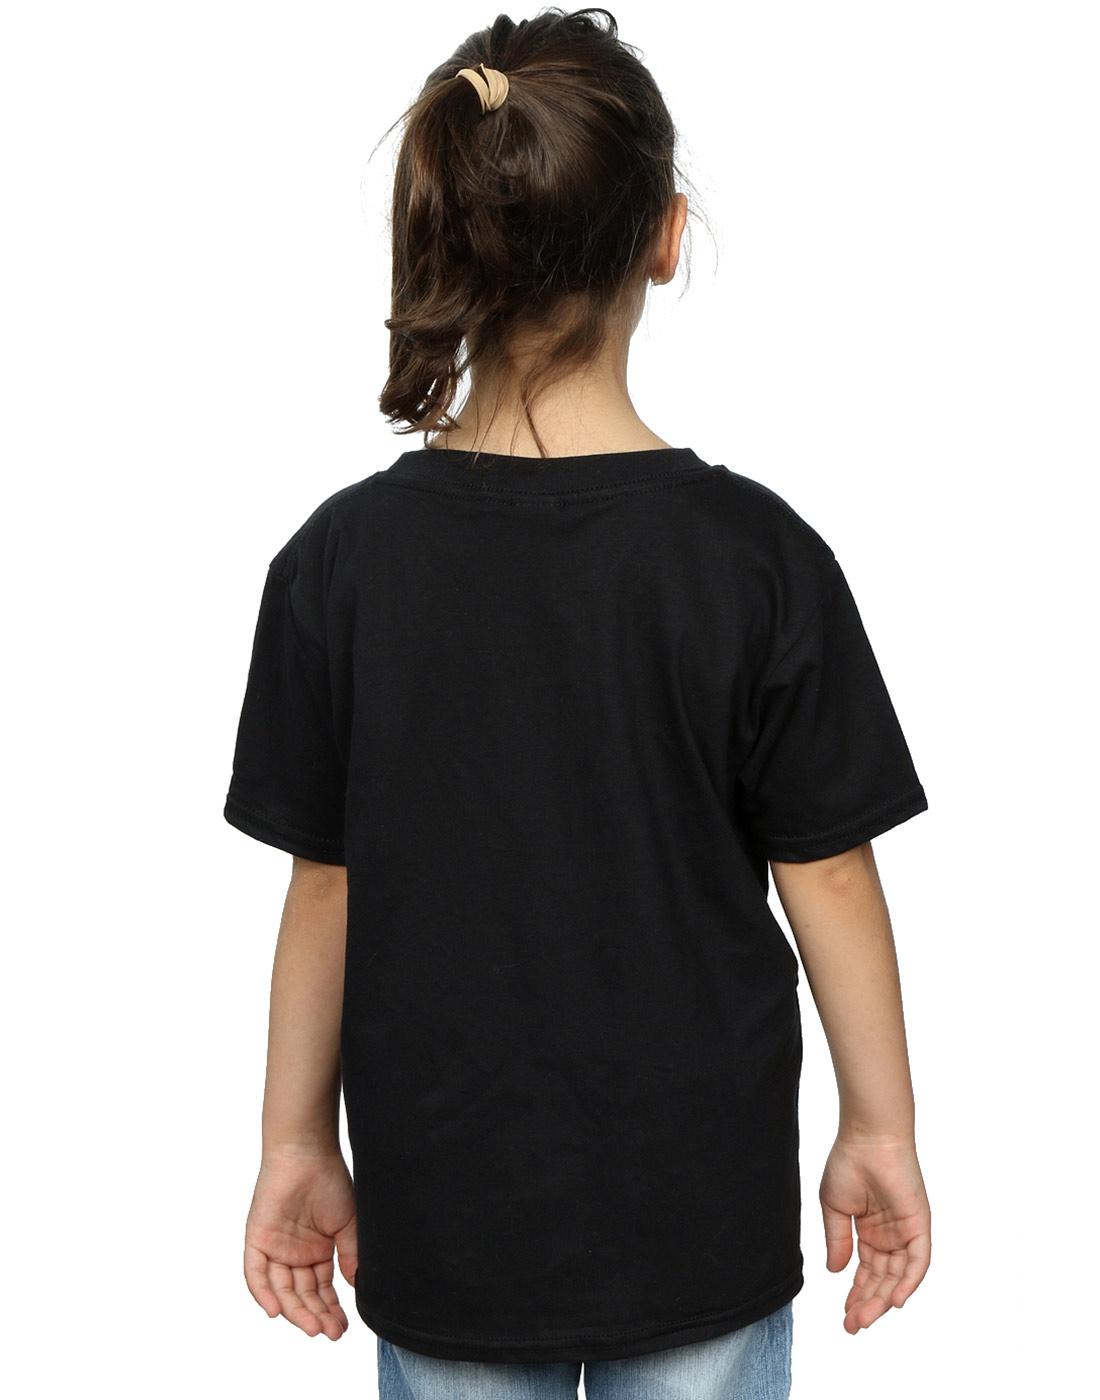 DC-Comics-Maedchen-Wonder-Woman-Posing-T-Shirt